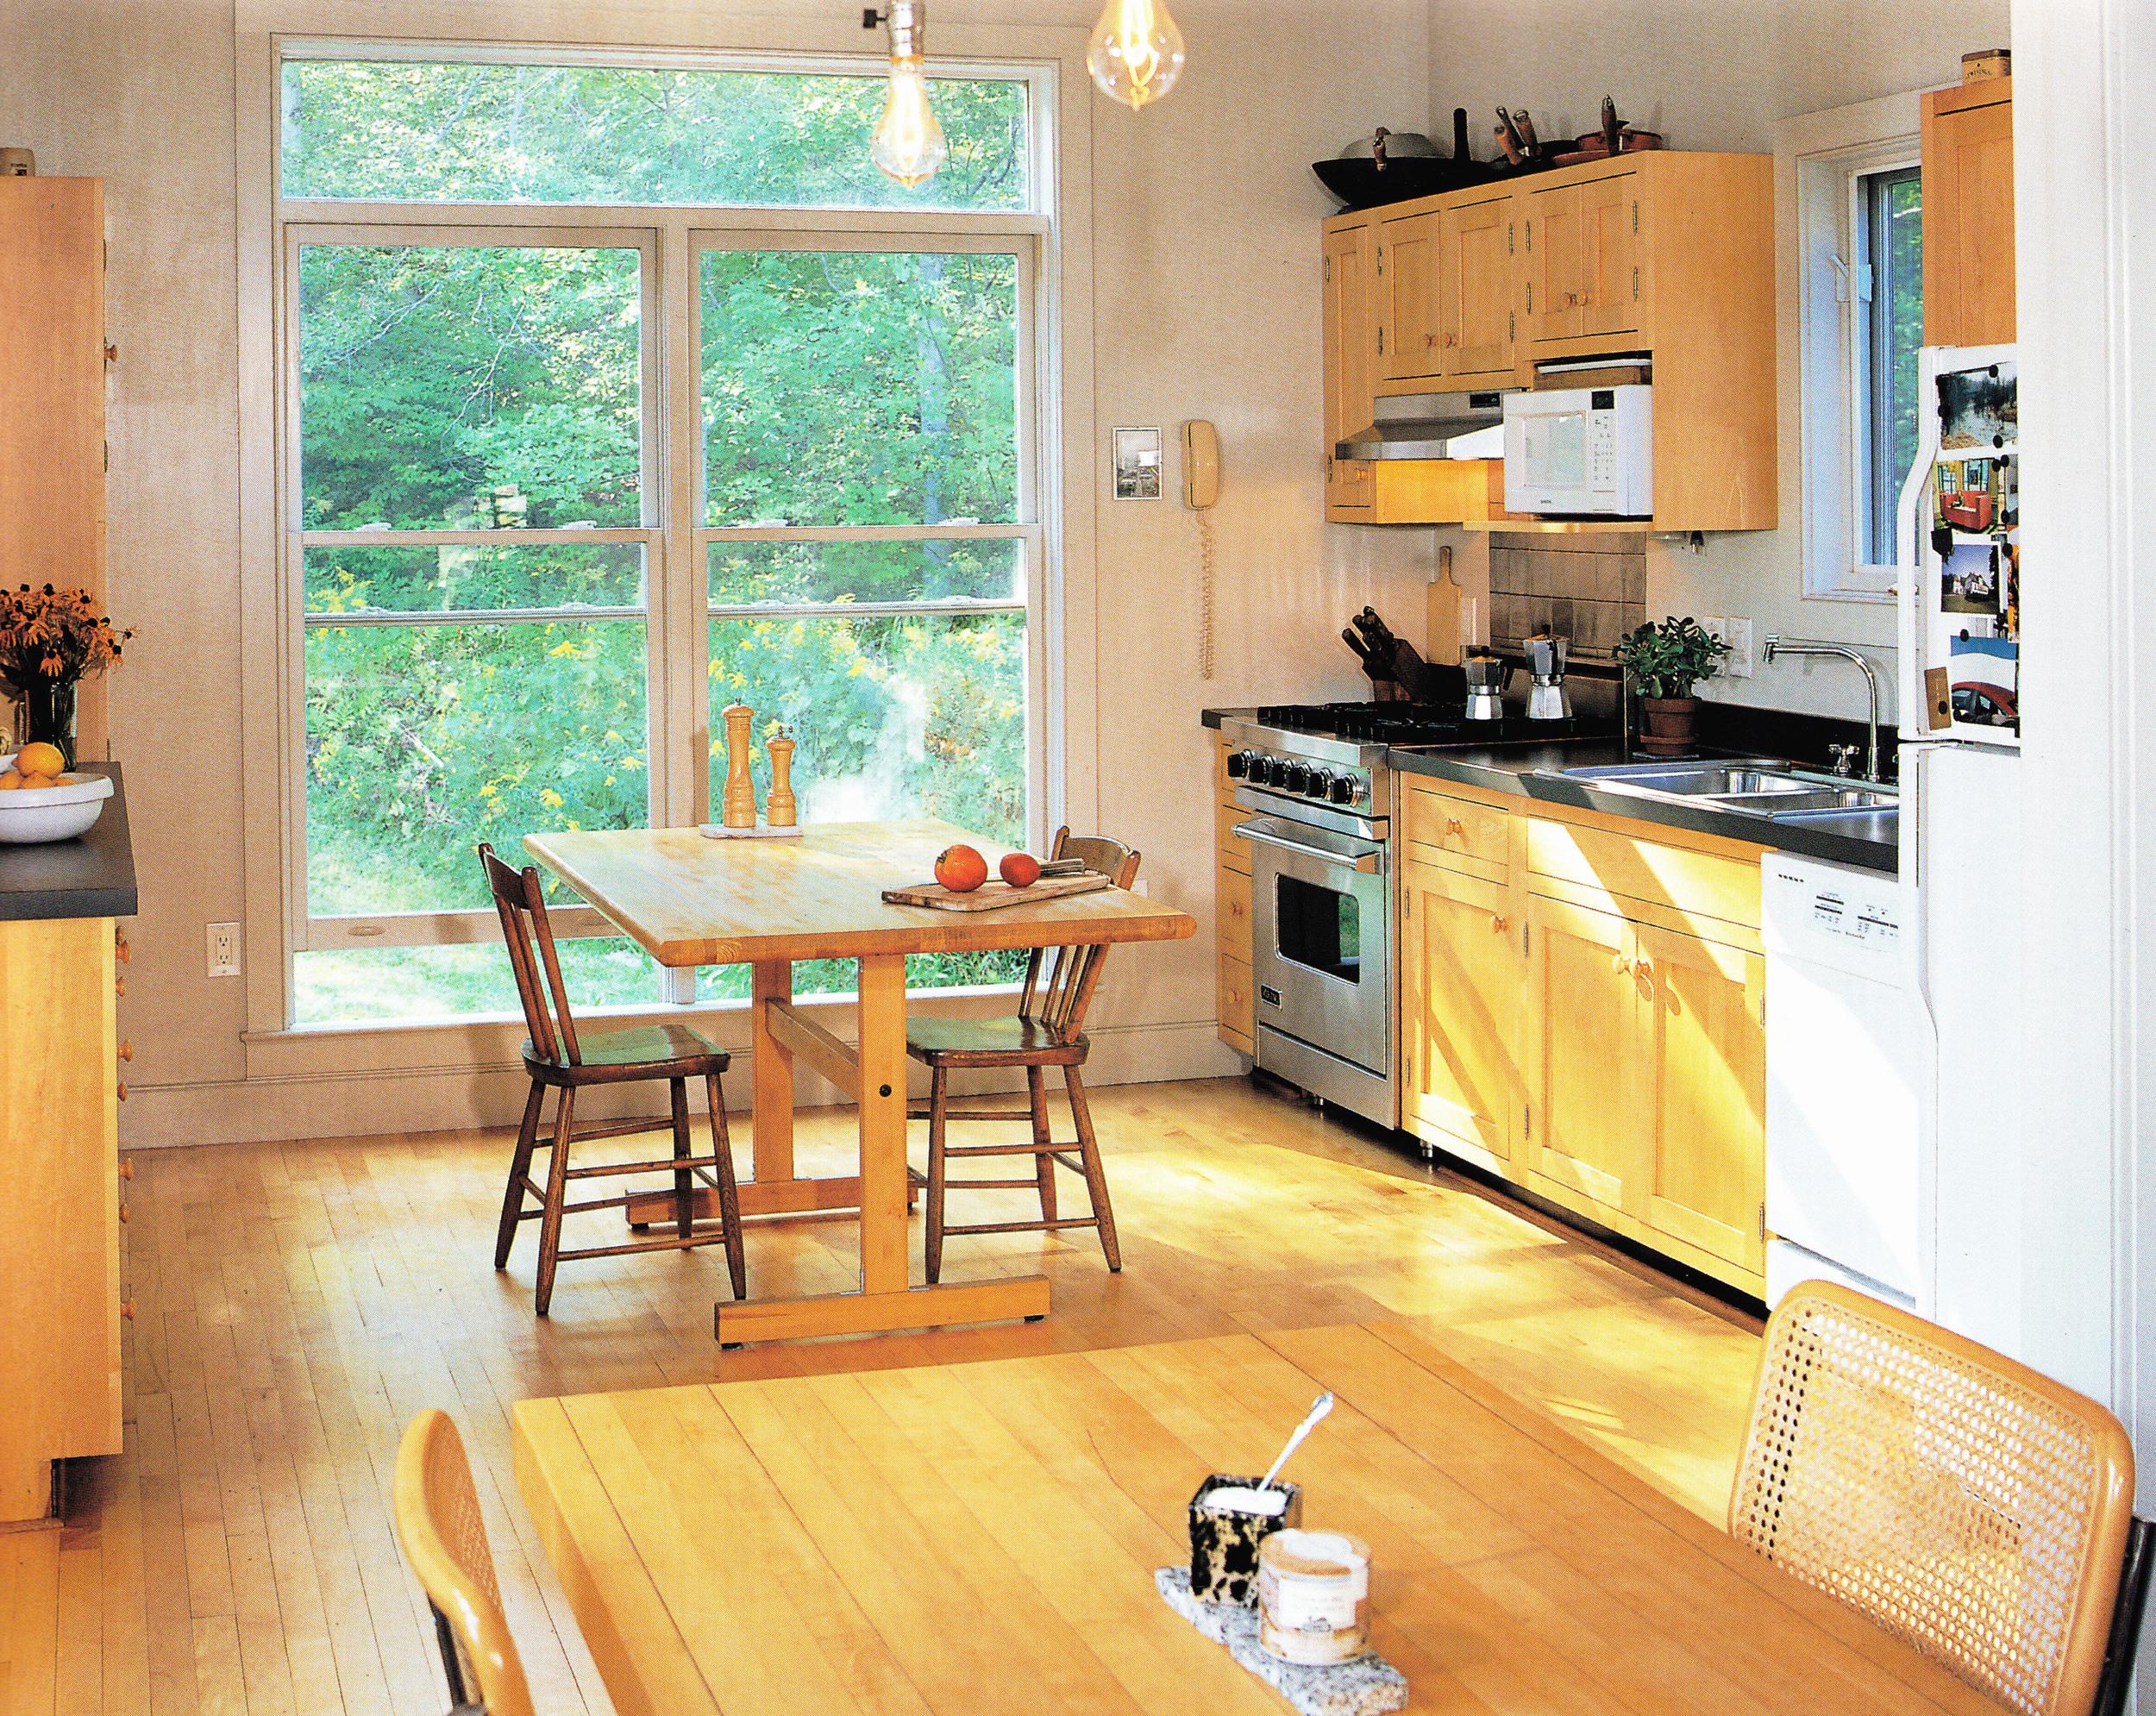 House on a Budget_0006 copy GT copy.jpg